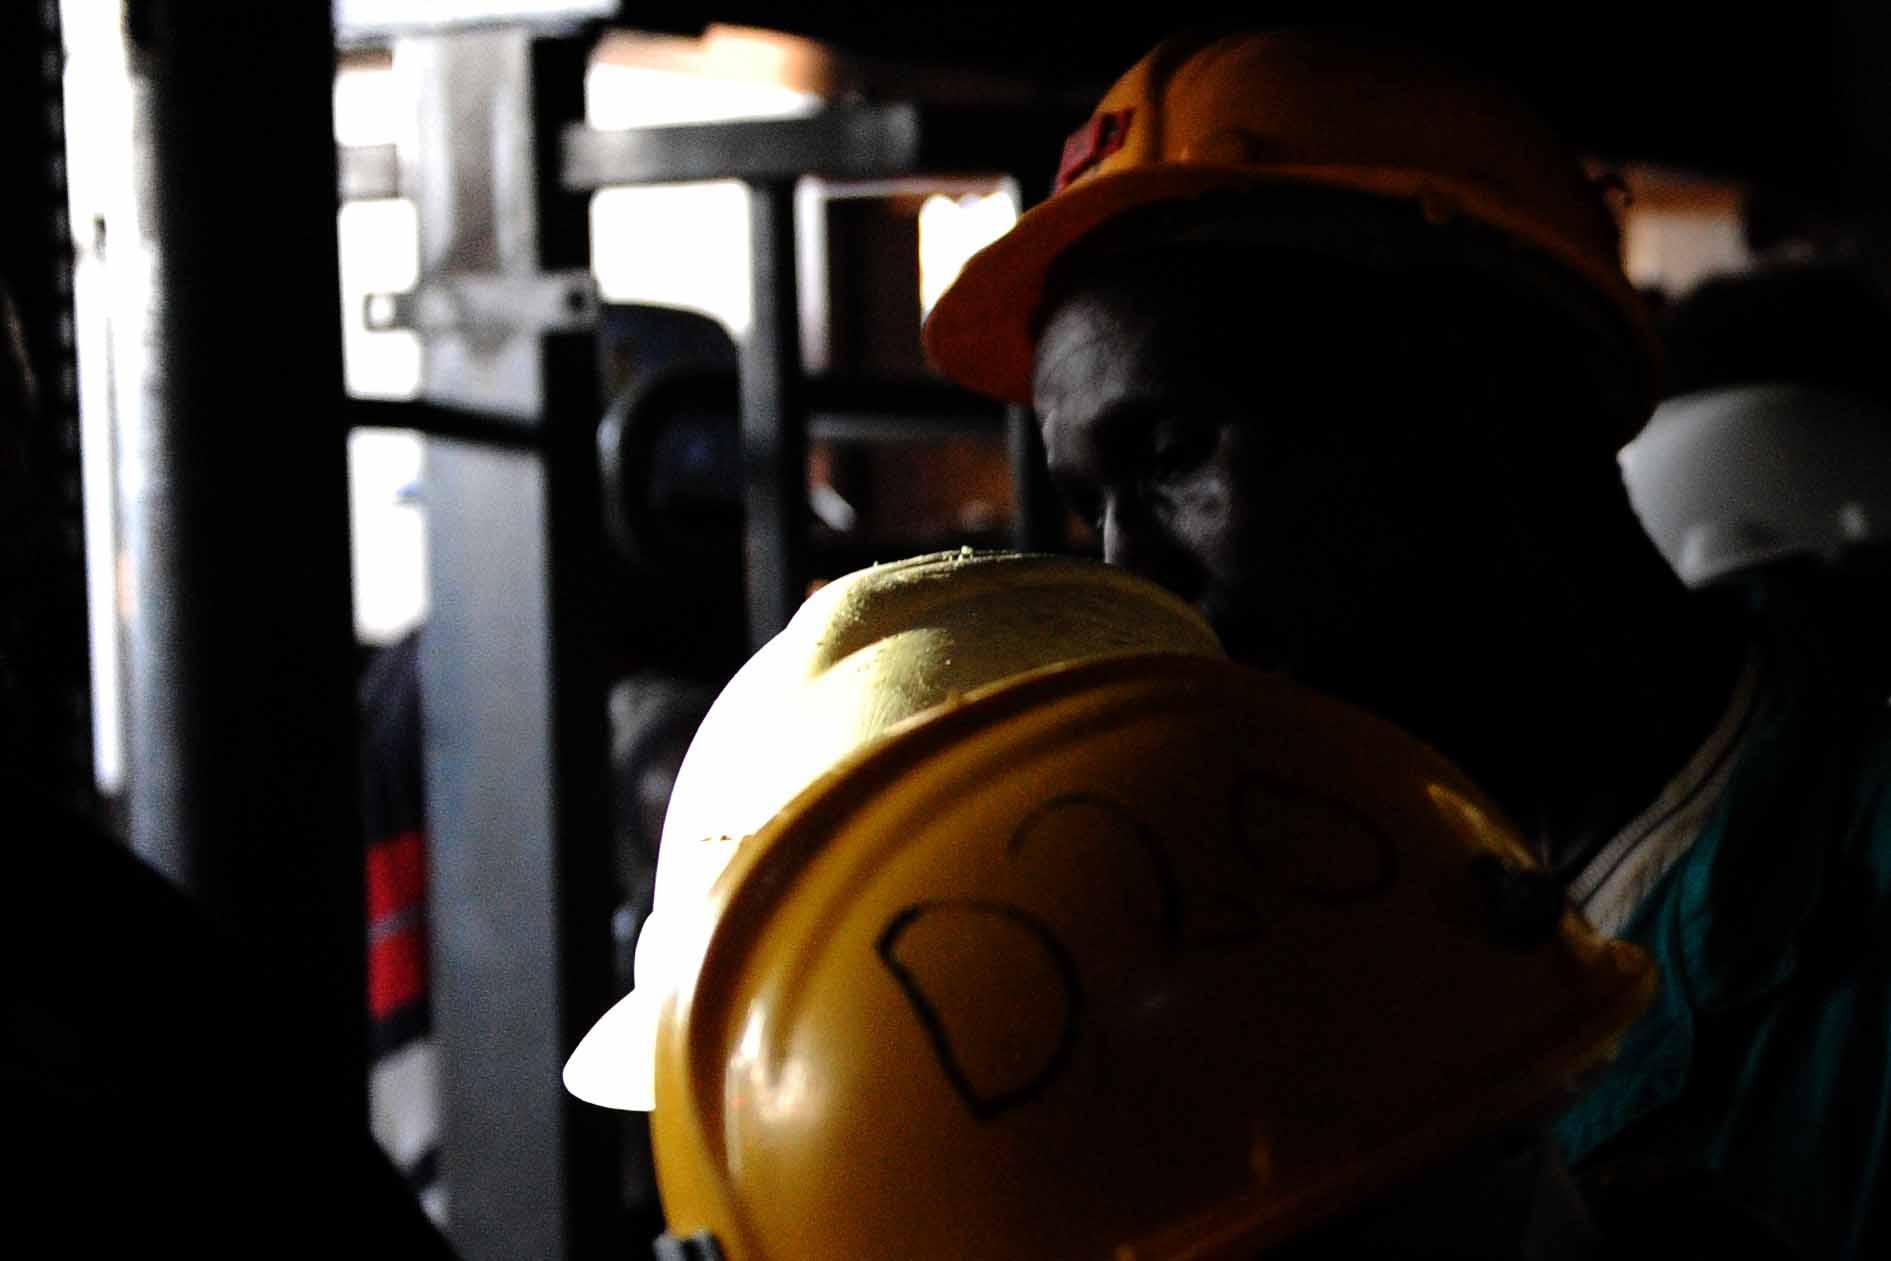 Mining income for 2012 was R408 billion – Stats SA